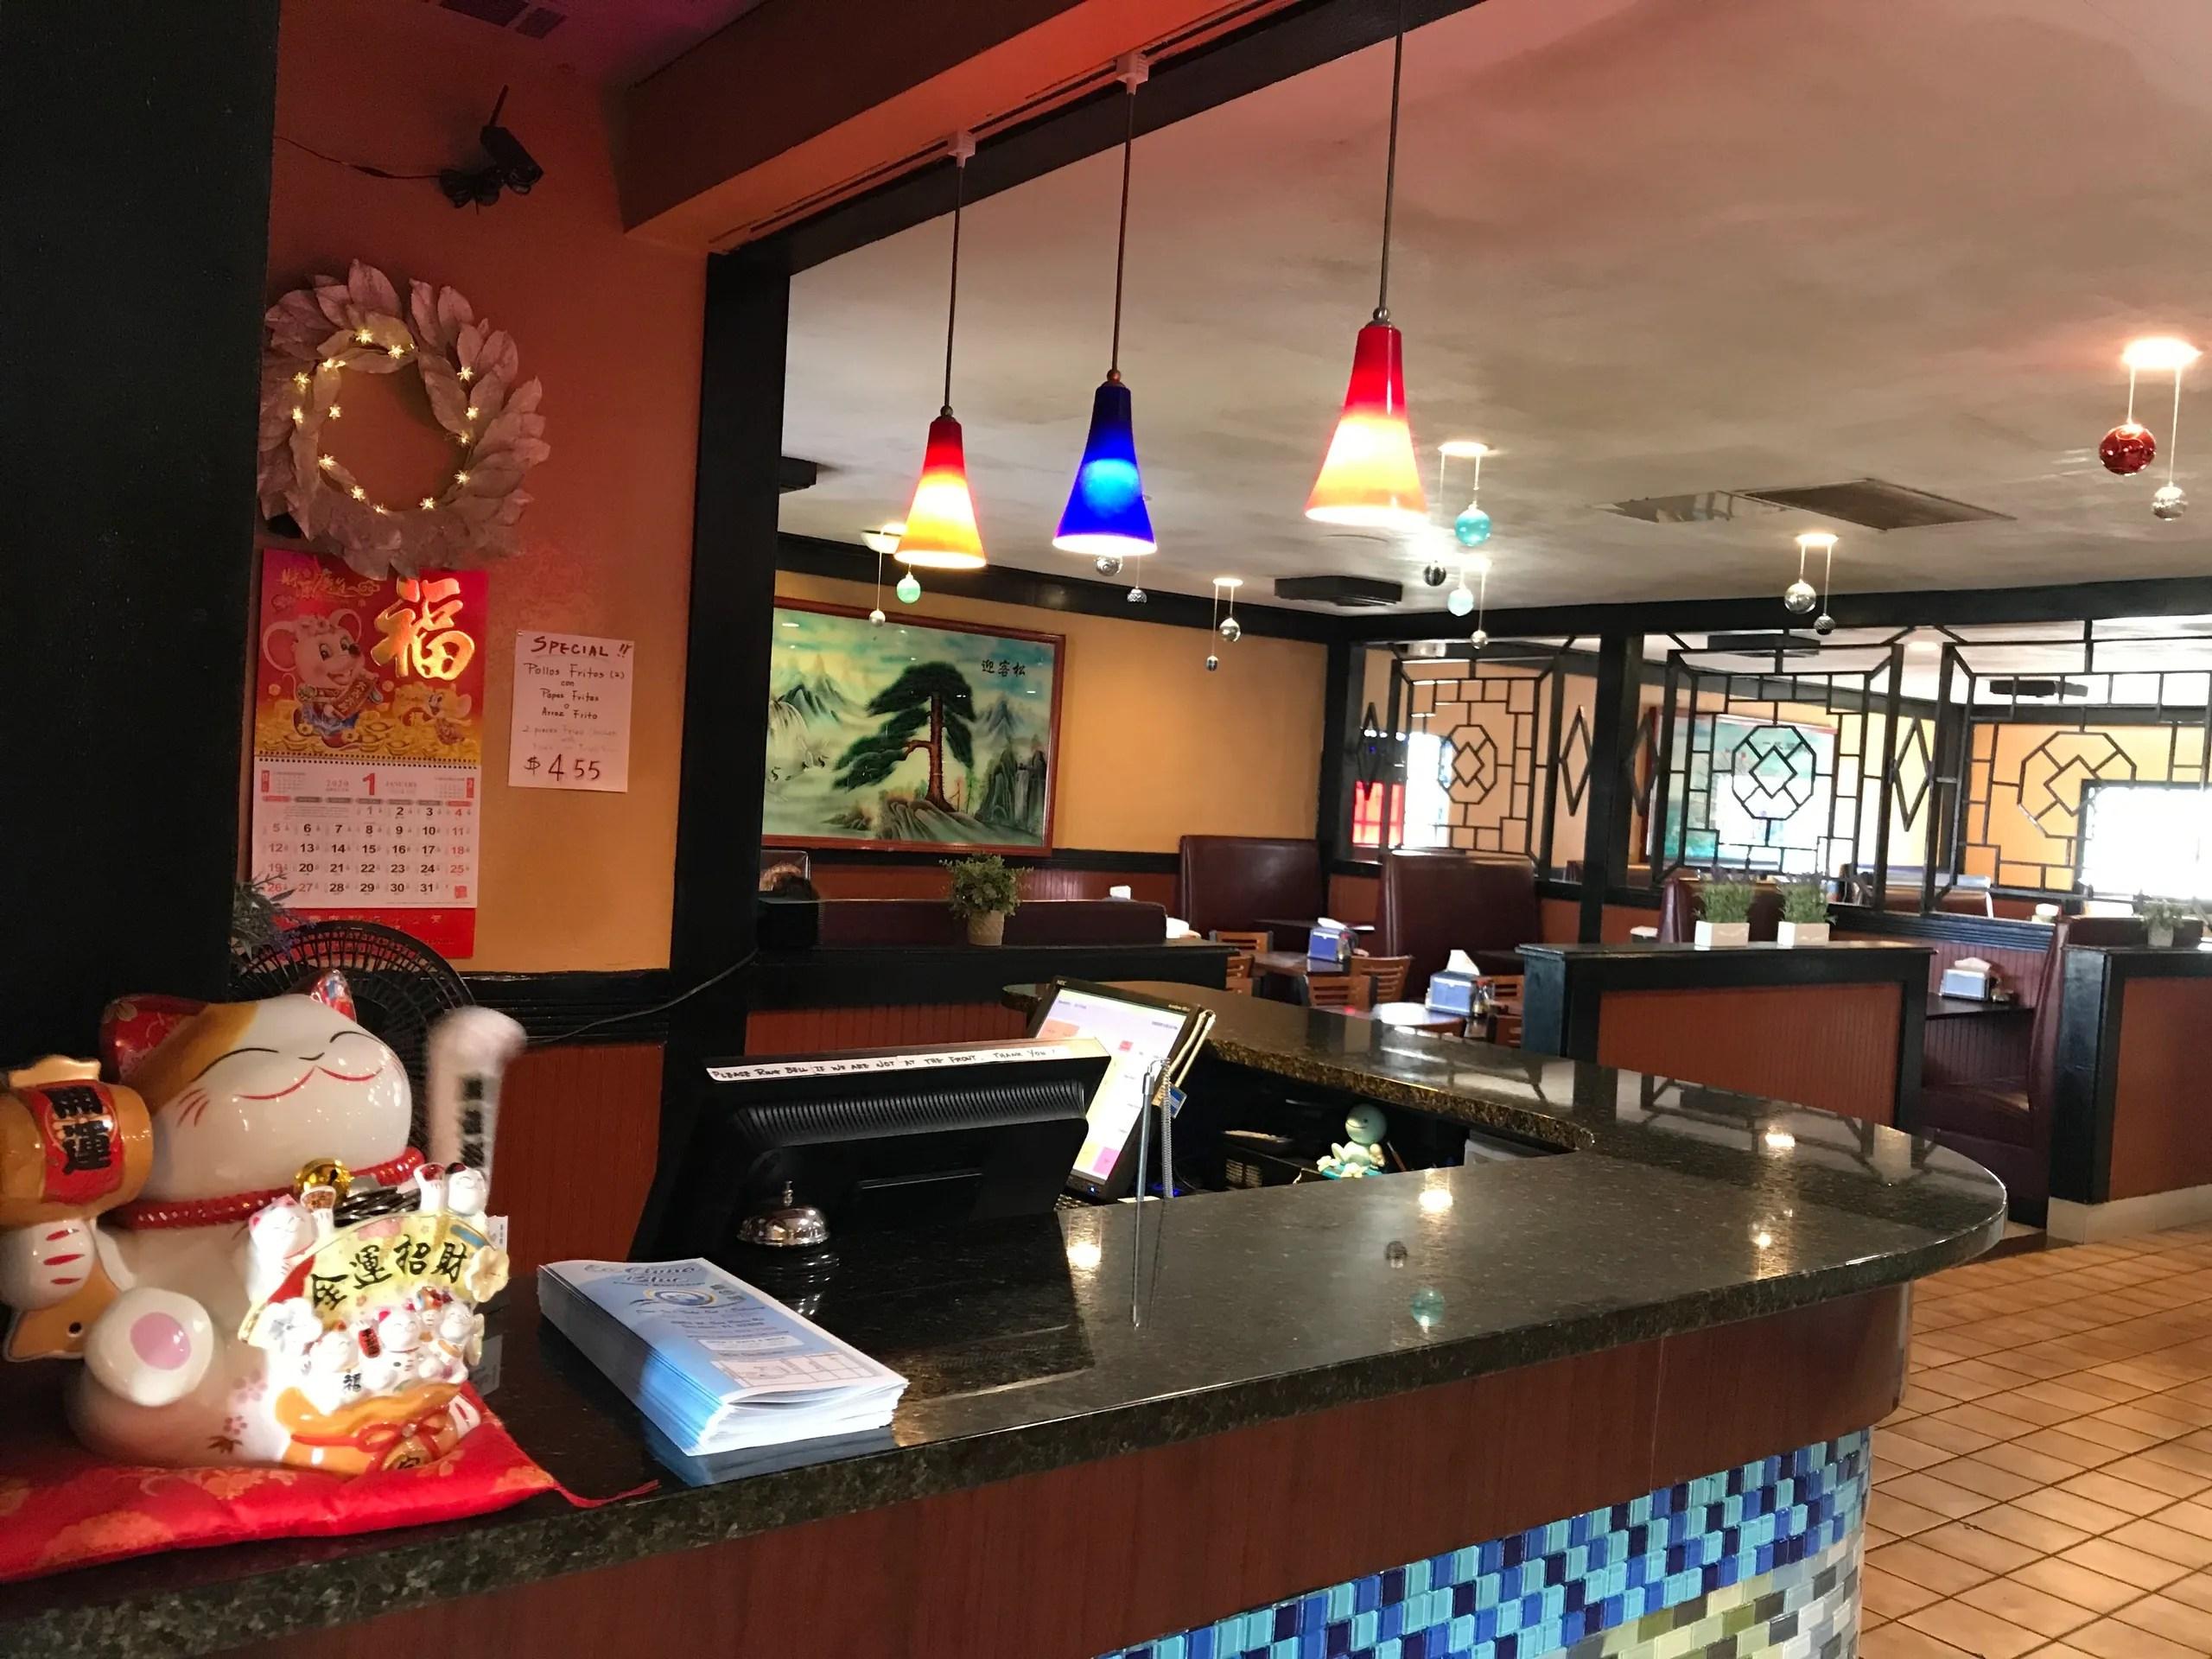 Chinese Food - La China Blue Chinese Restaurant | La China Blue Chinese Restaurant